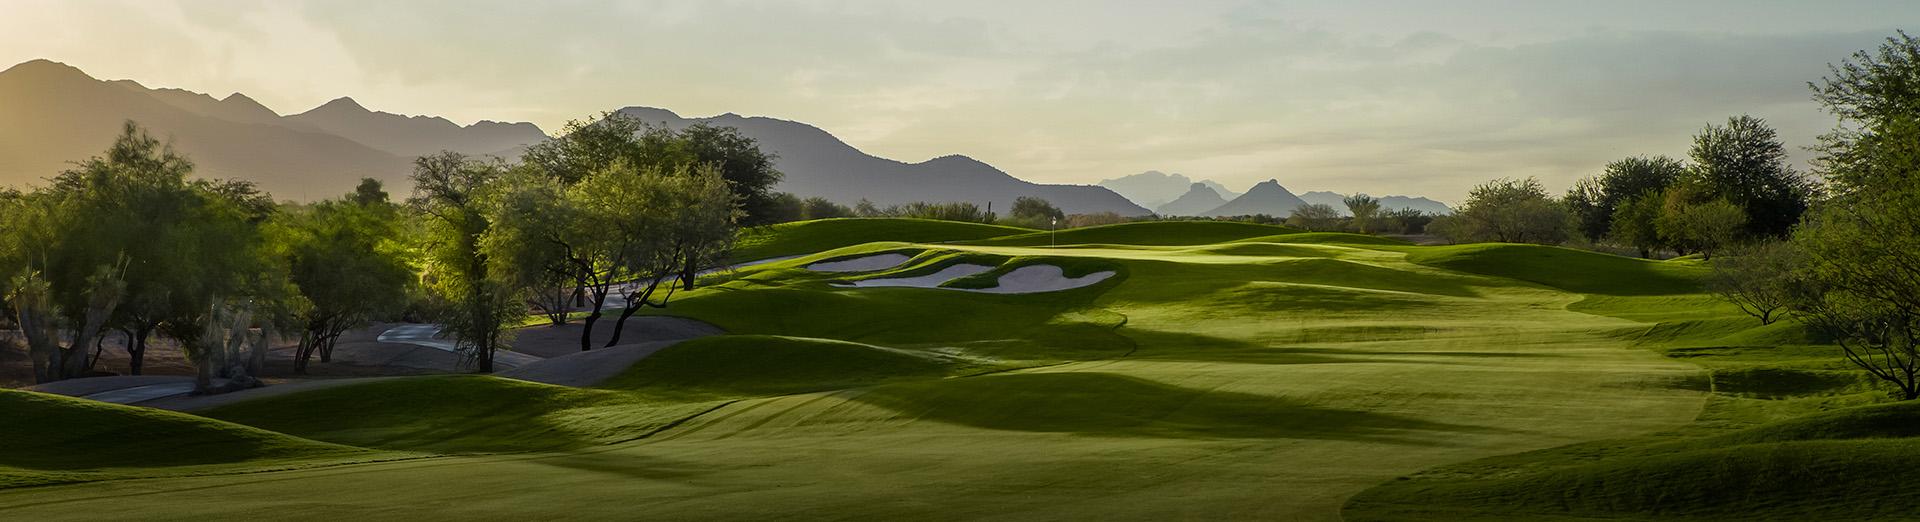 Scottsdale-Golf-Pano_Web